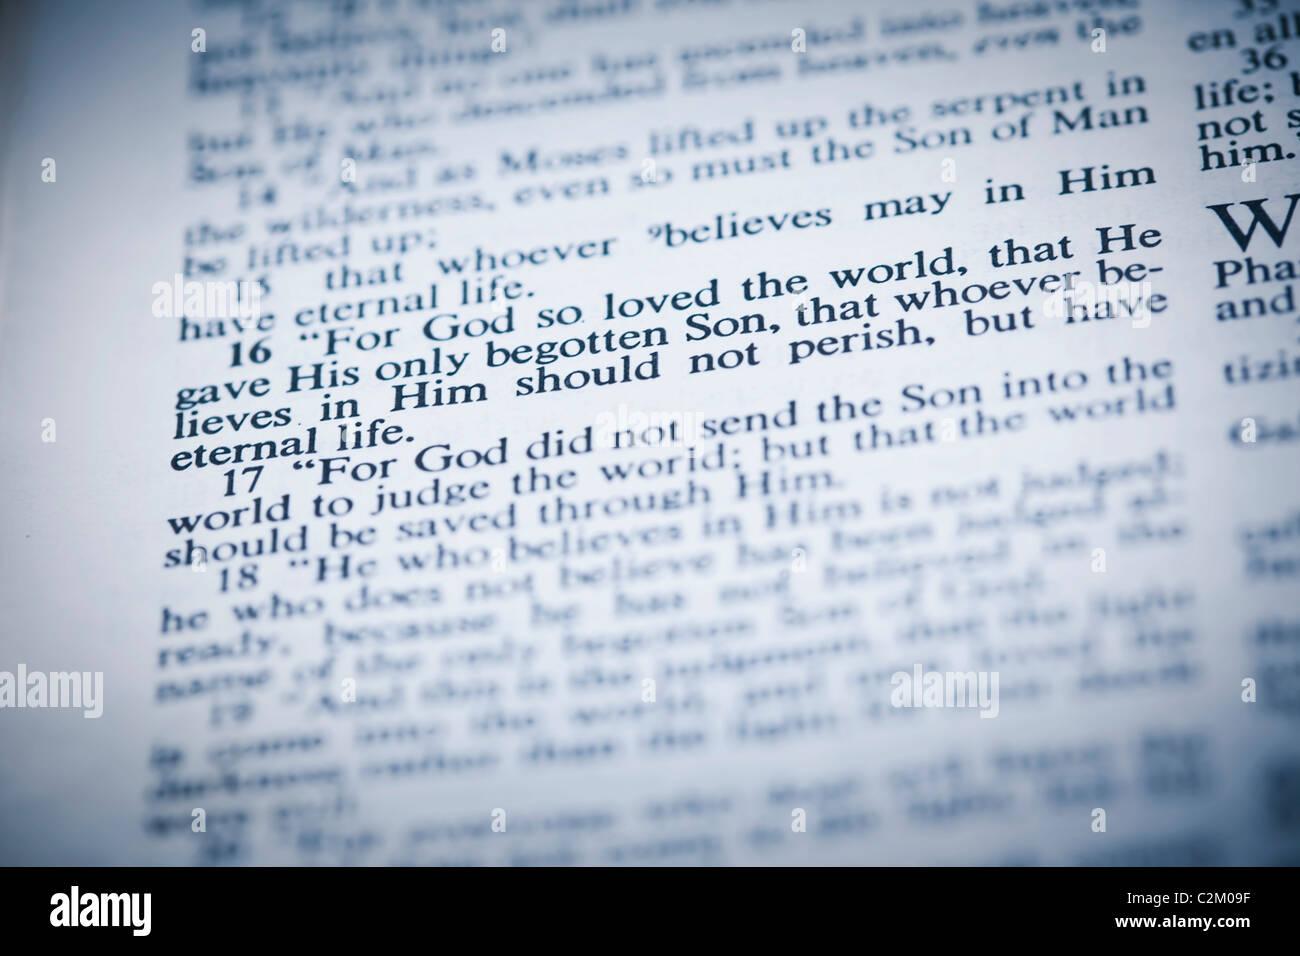 The New American Standard Bible Open To John 3:16 Stock Photo ...